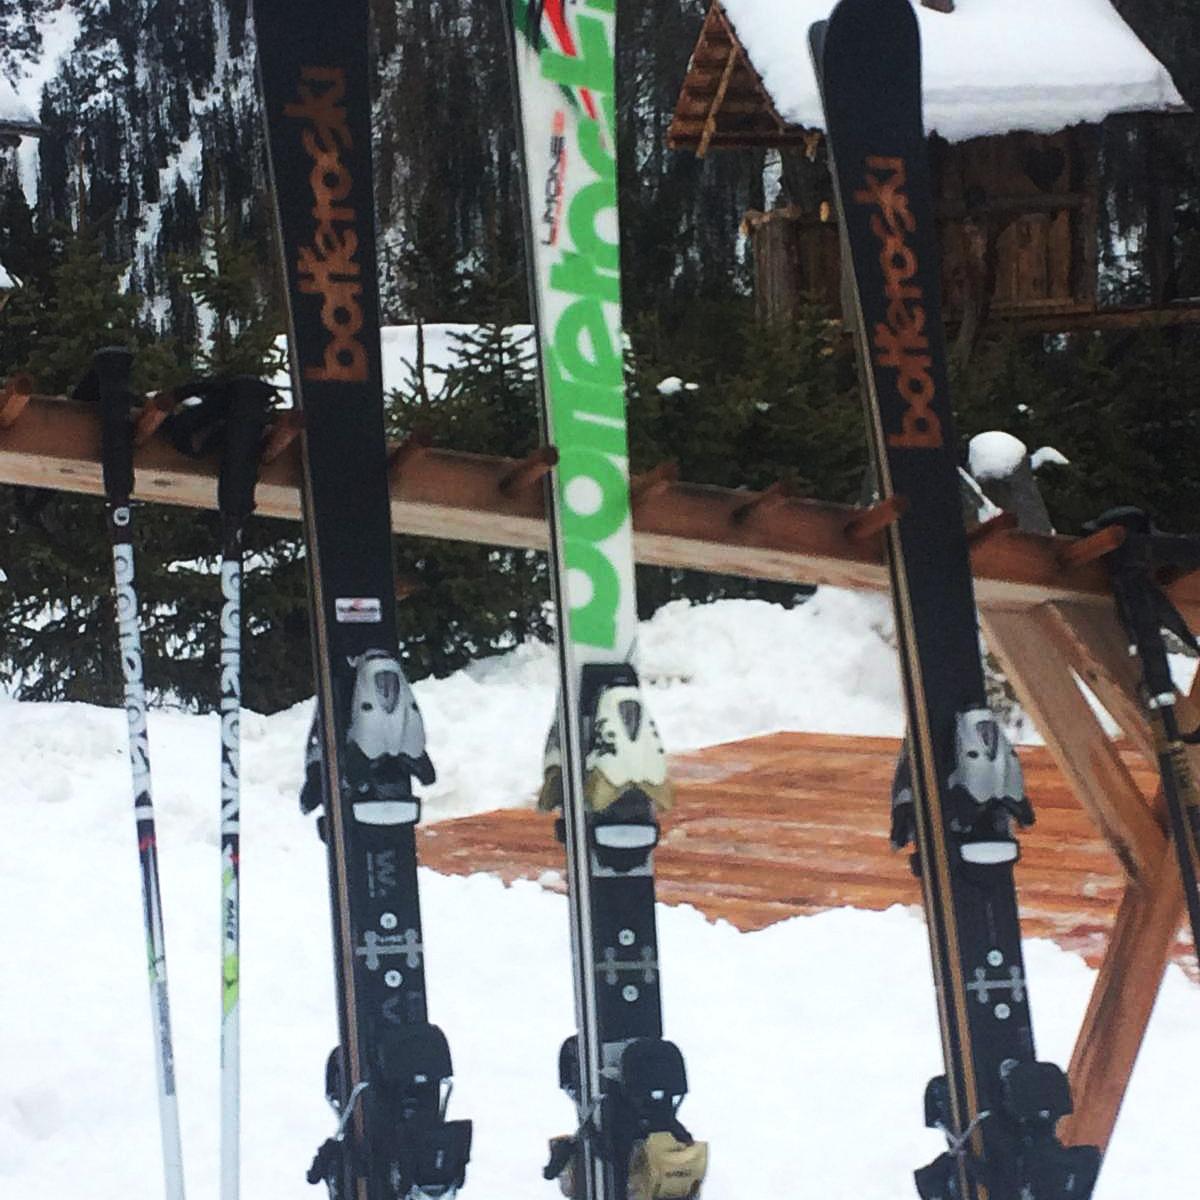 sci bottero ski grand elite e limone